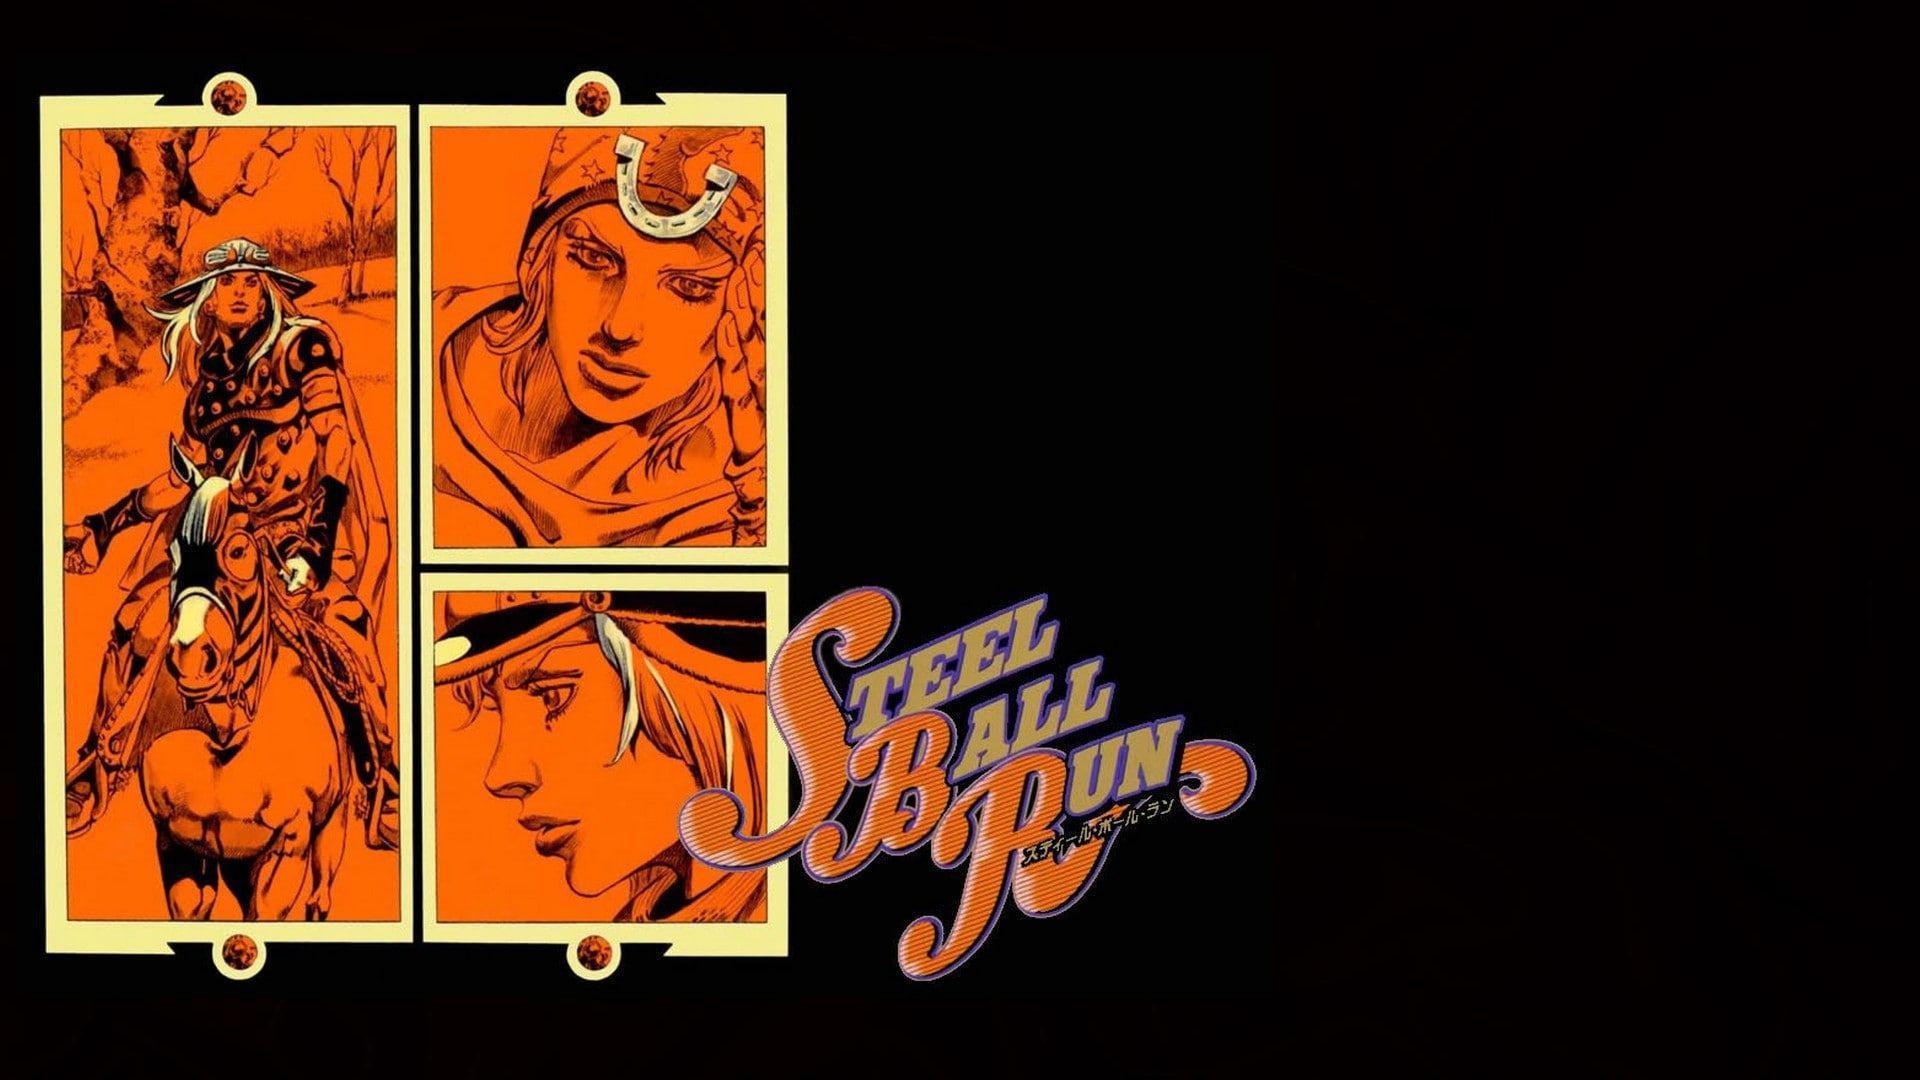 Steel Ball Run Wallpapers - Top Free Steel Ball Run ...